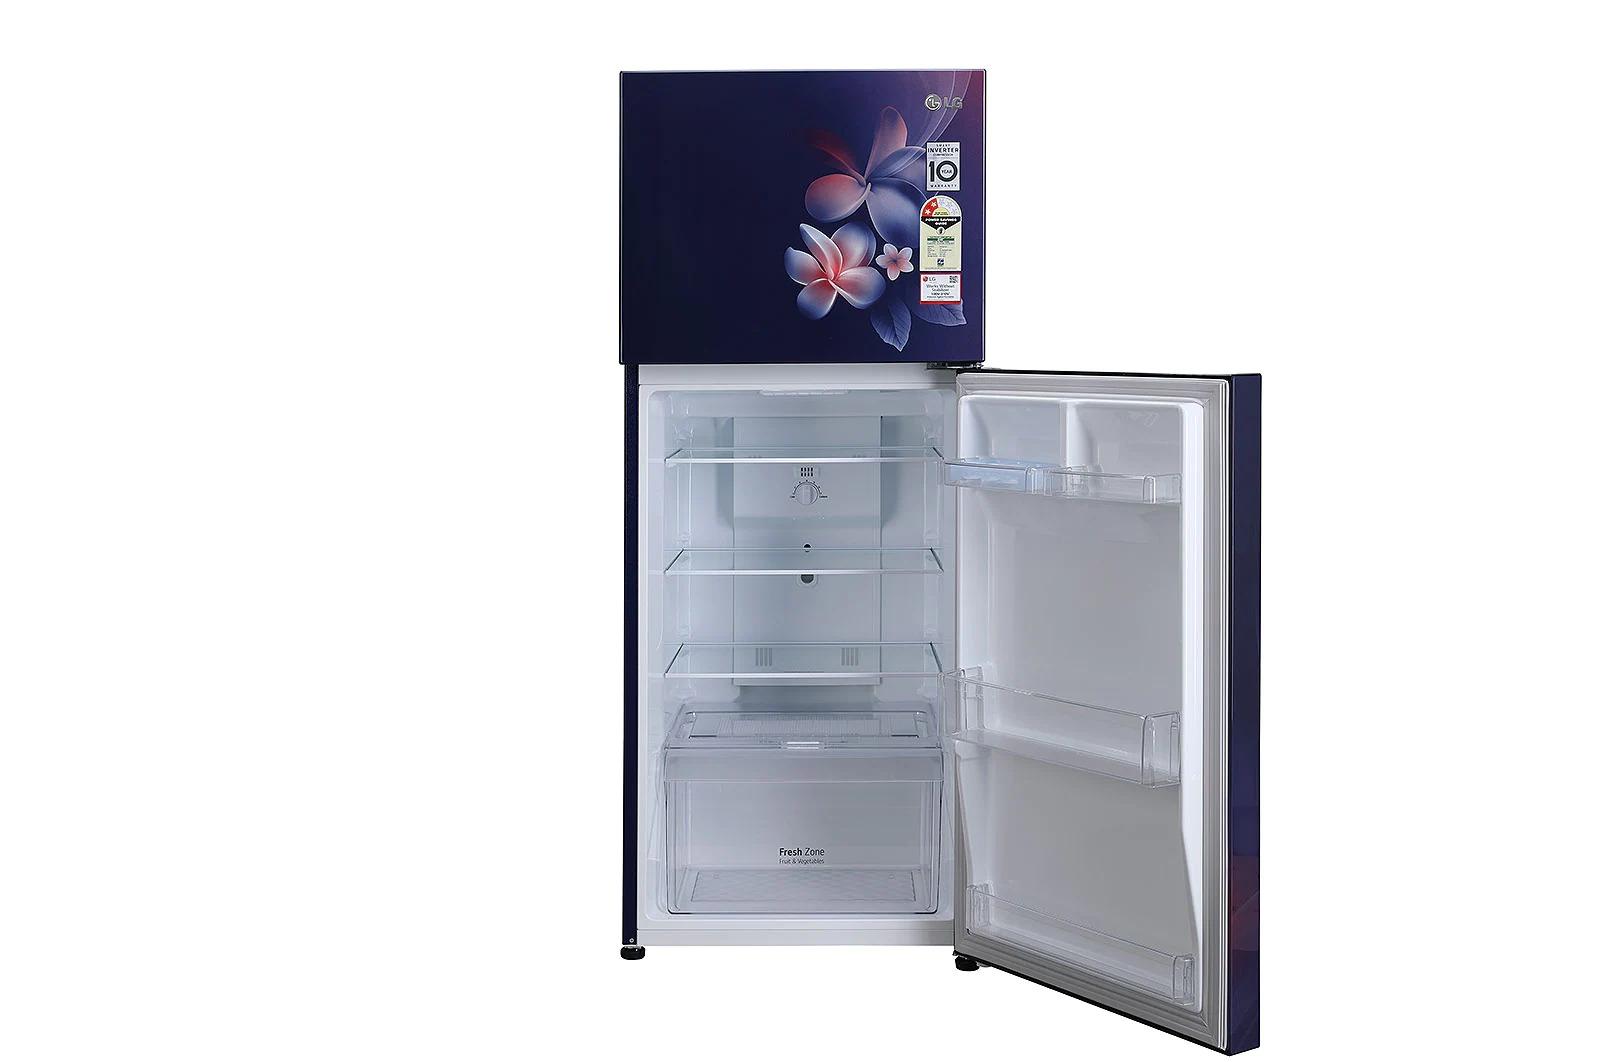 LG (GL-N292DBPY) 260 Litres Frost Free Refrigerator With Smart Inverter Compressor, Multi Air Flow, MOIST 'N' FRESH, LED Lighting